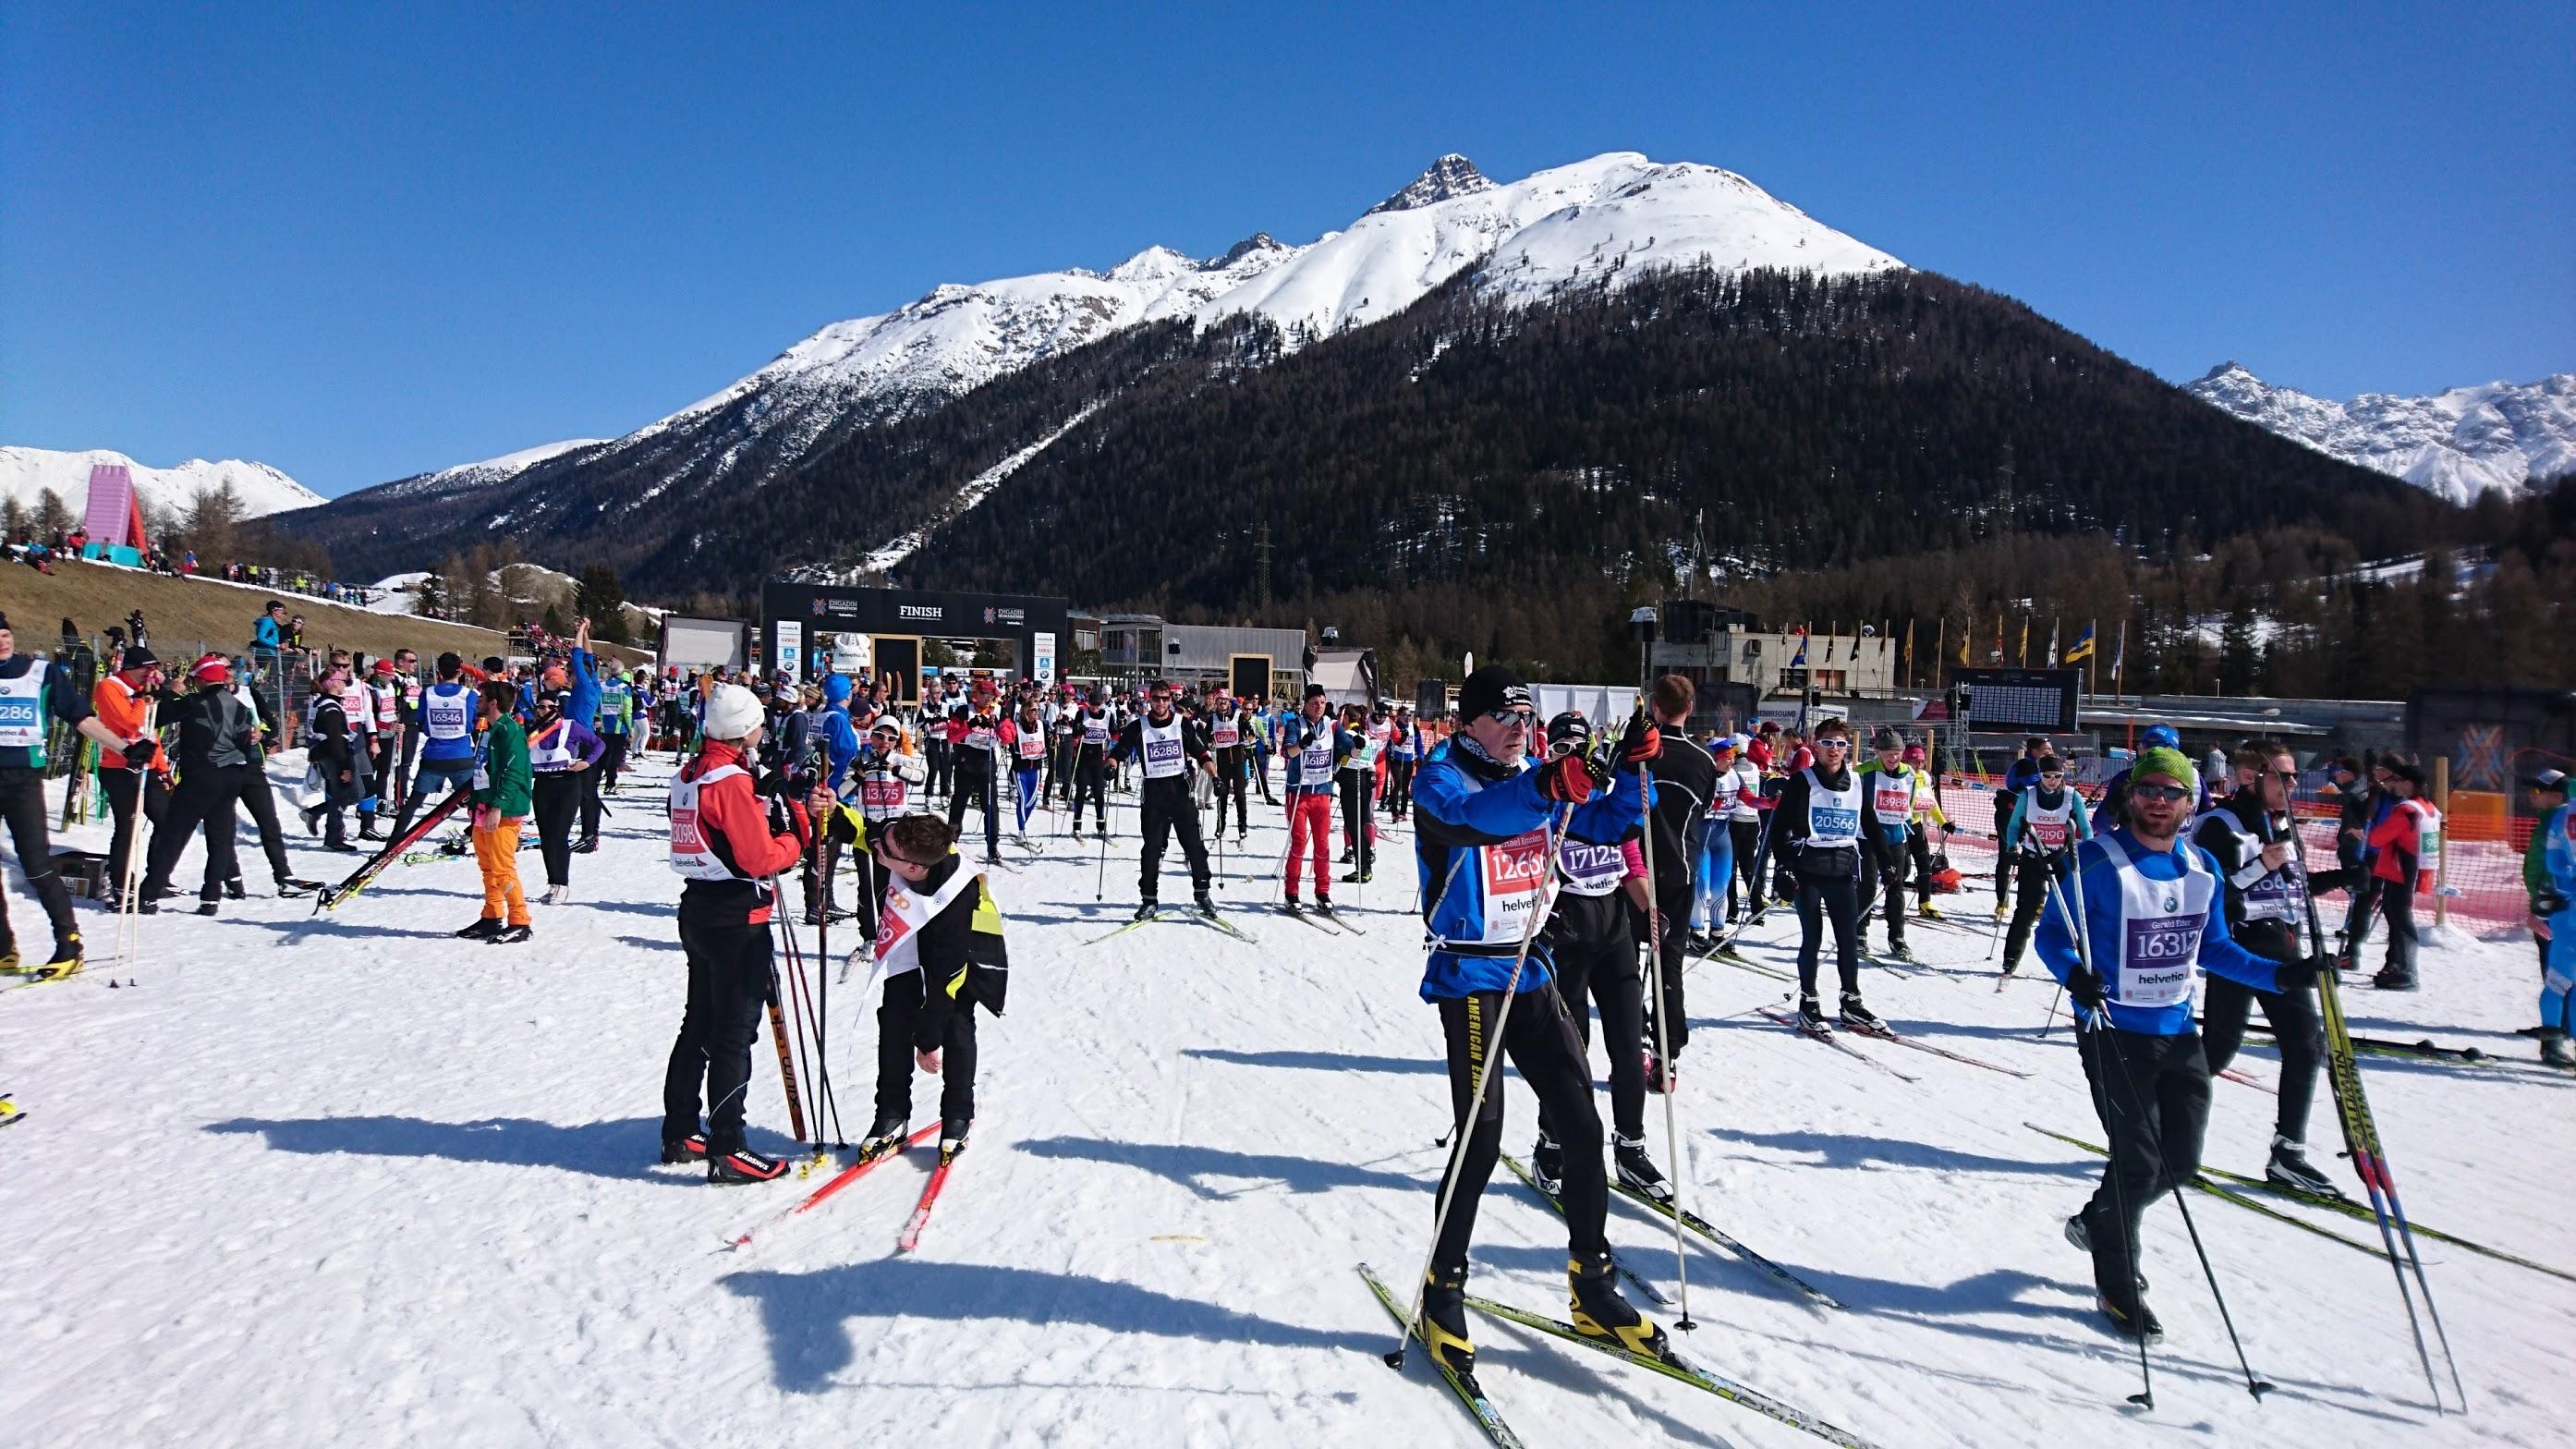 Engadin Ski Marathon Plans Expansion